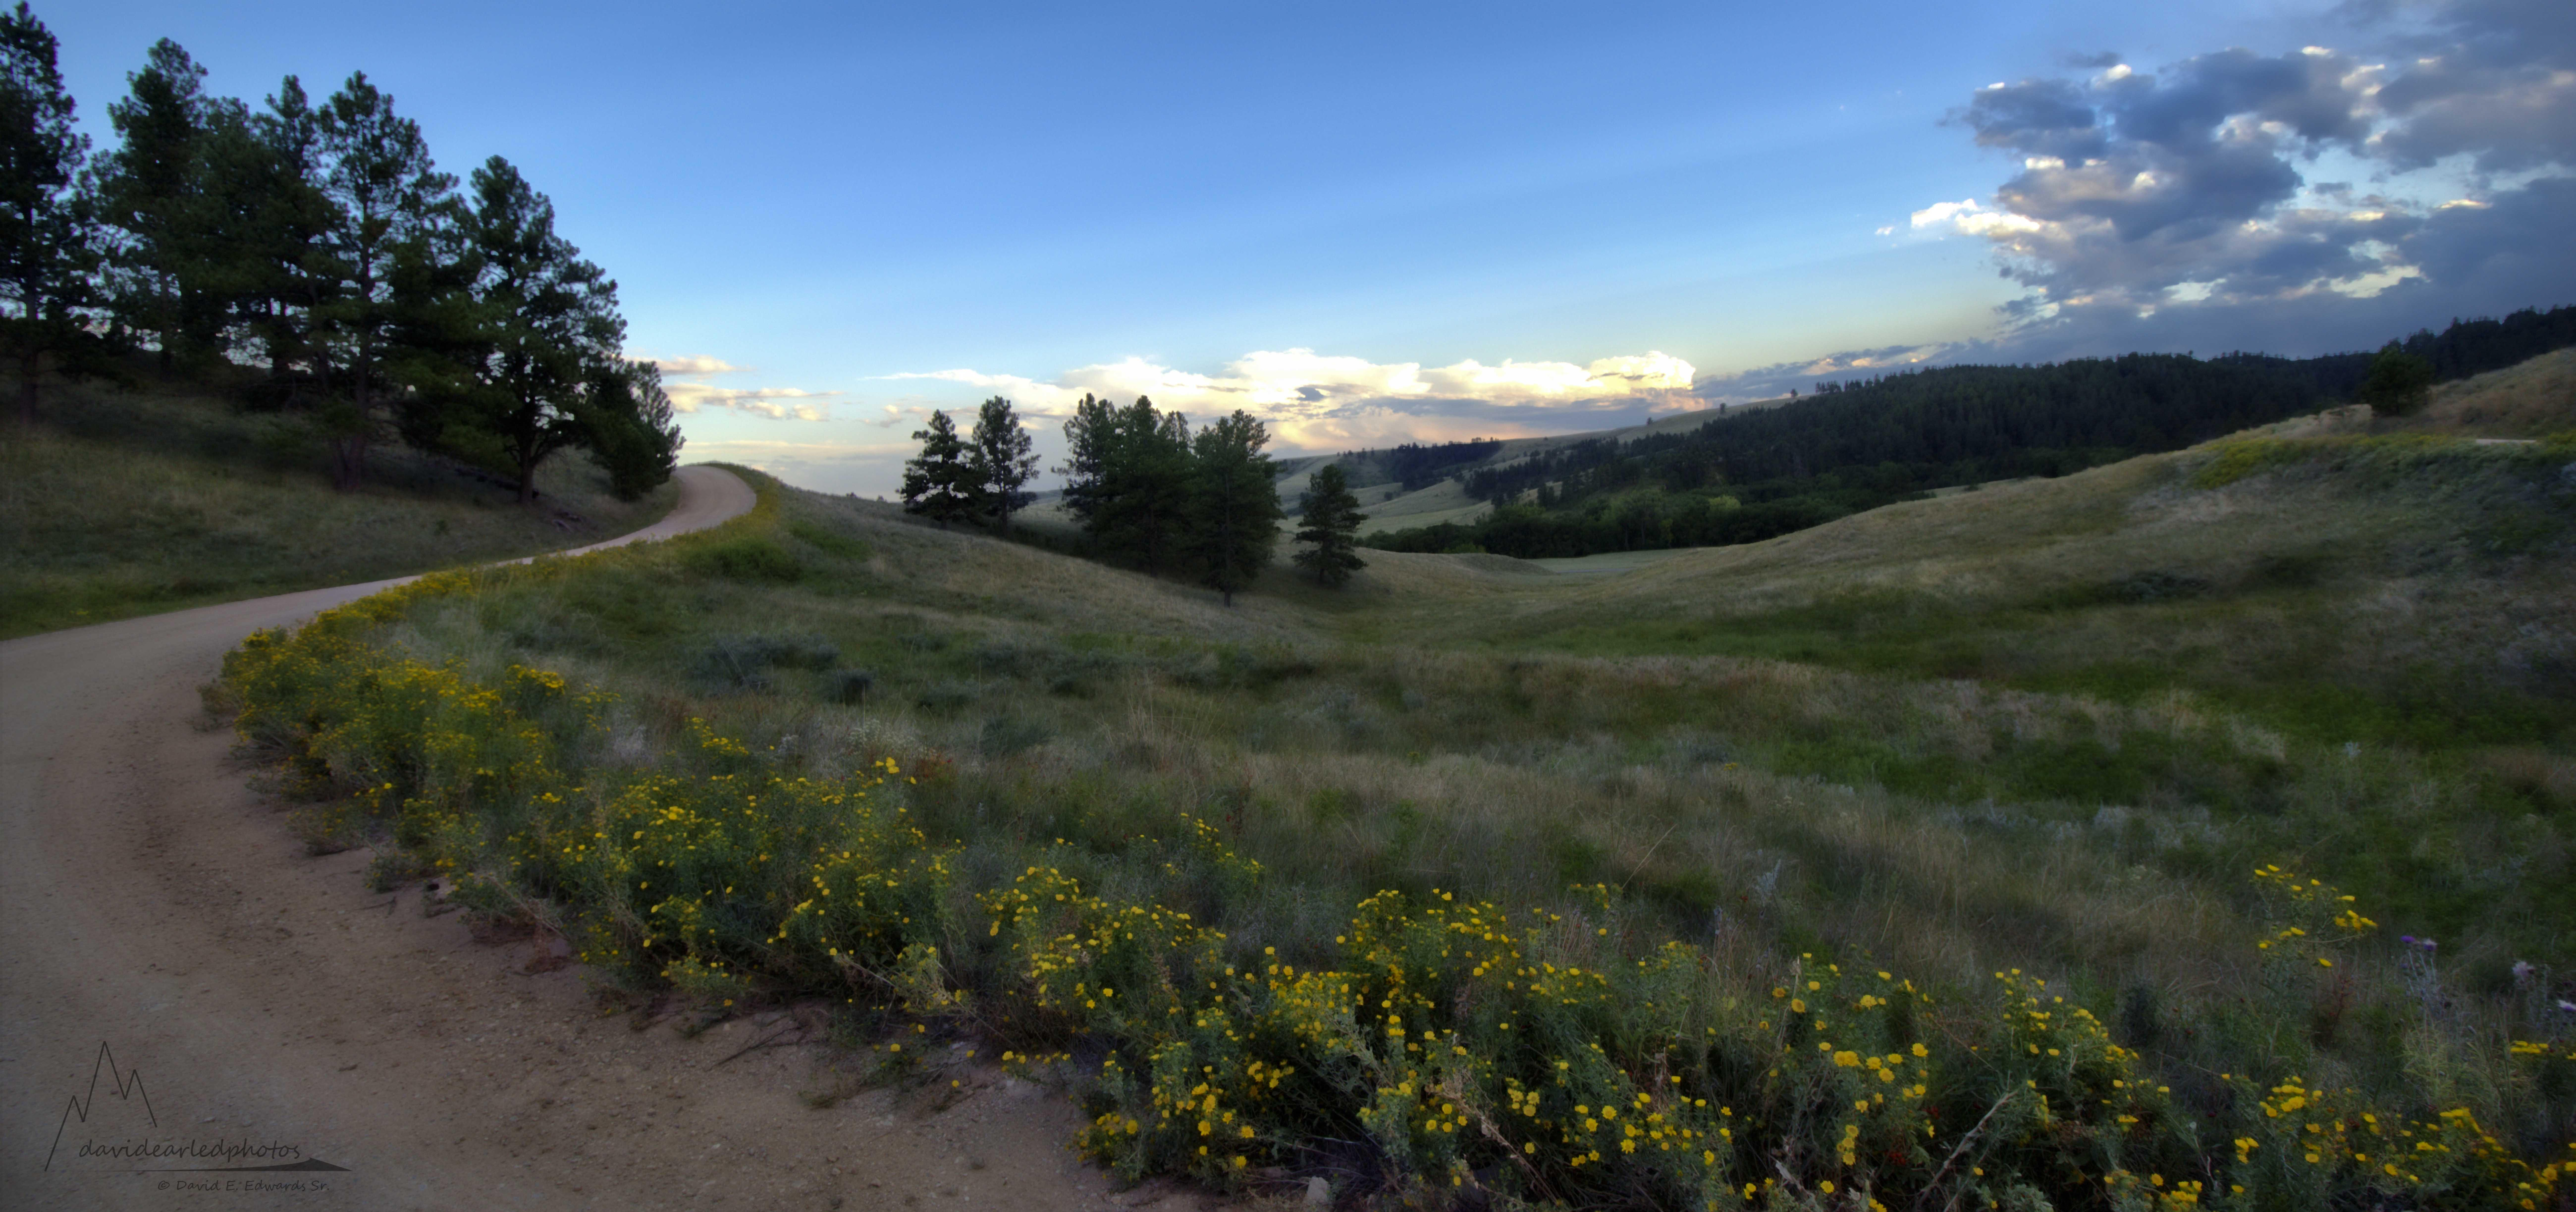 Soft Custer State Park Sunset